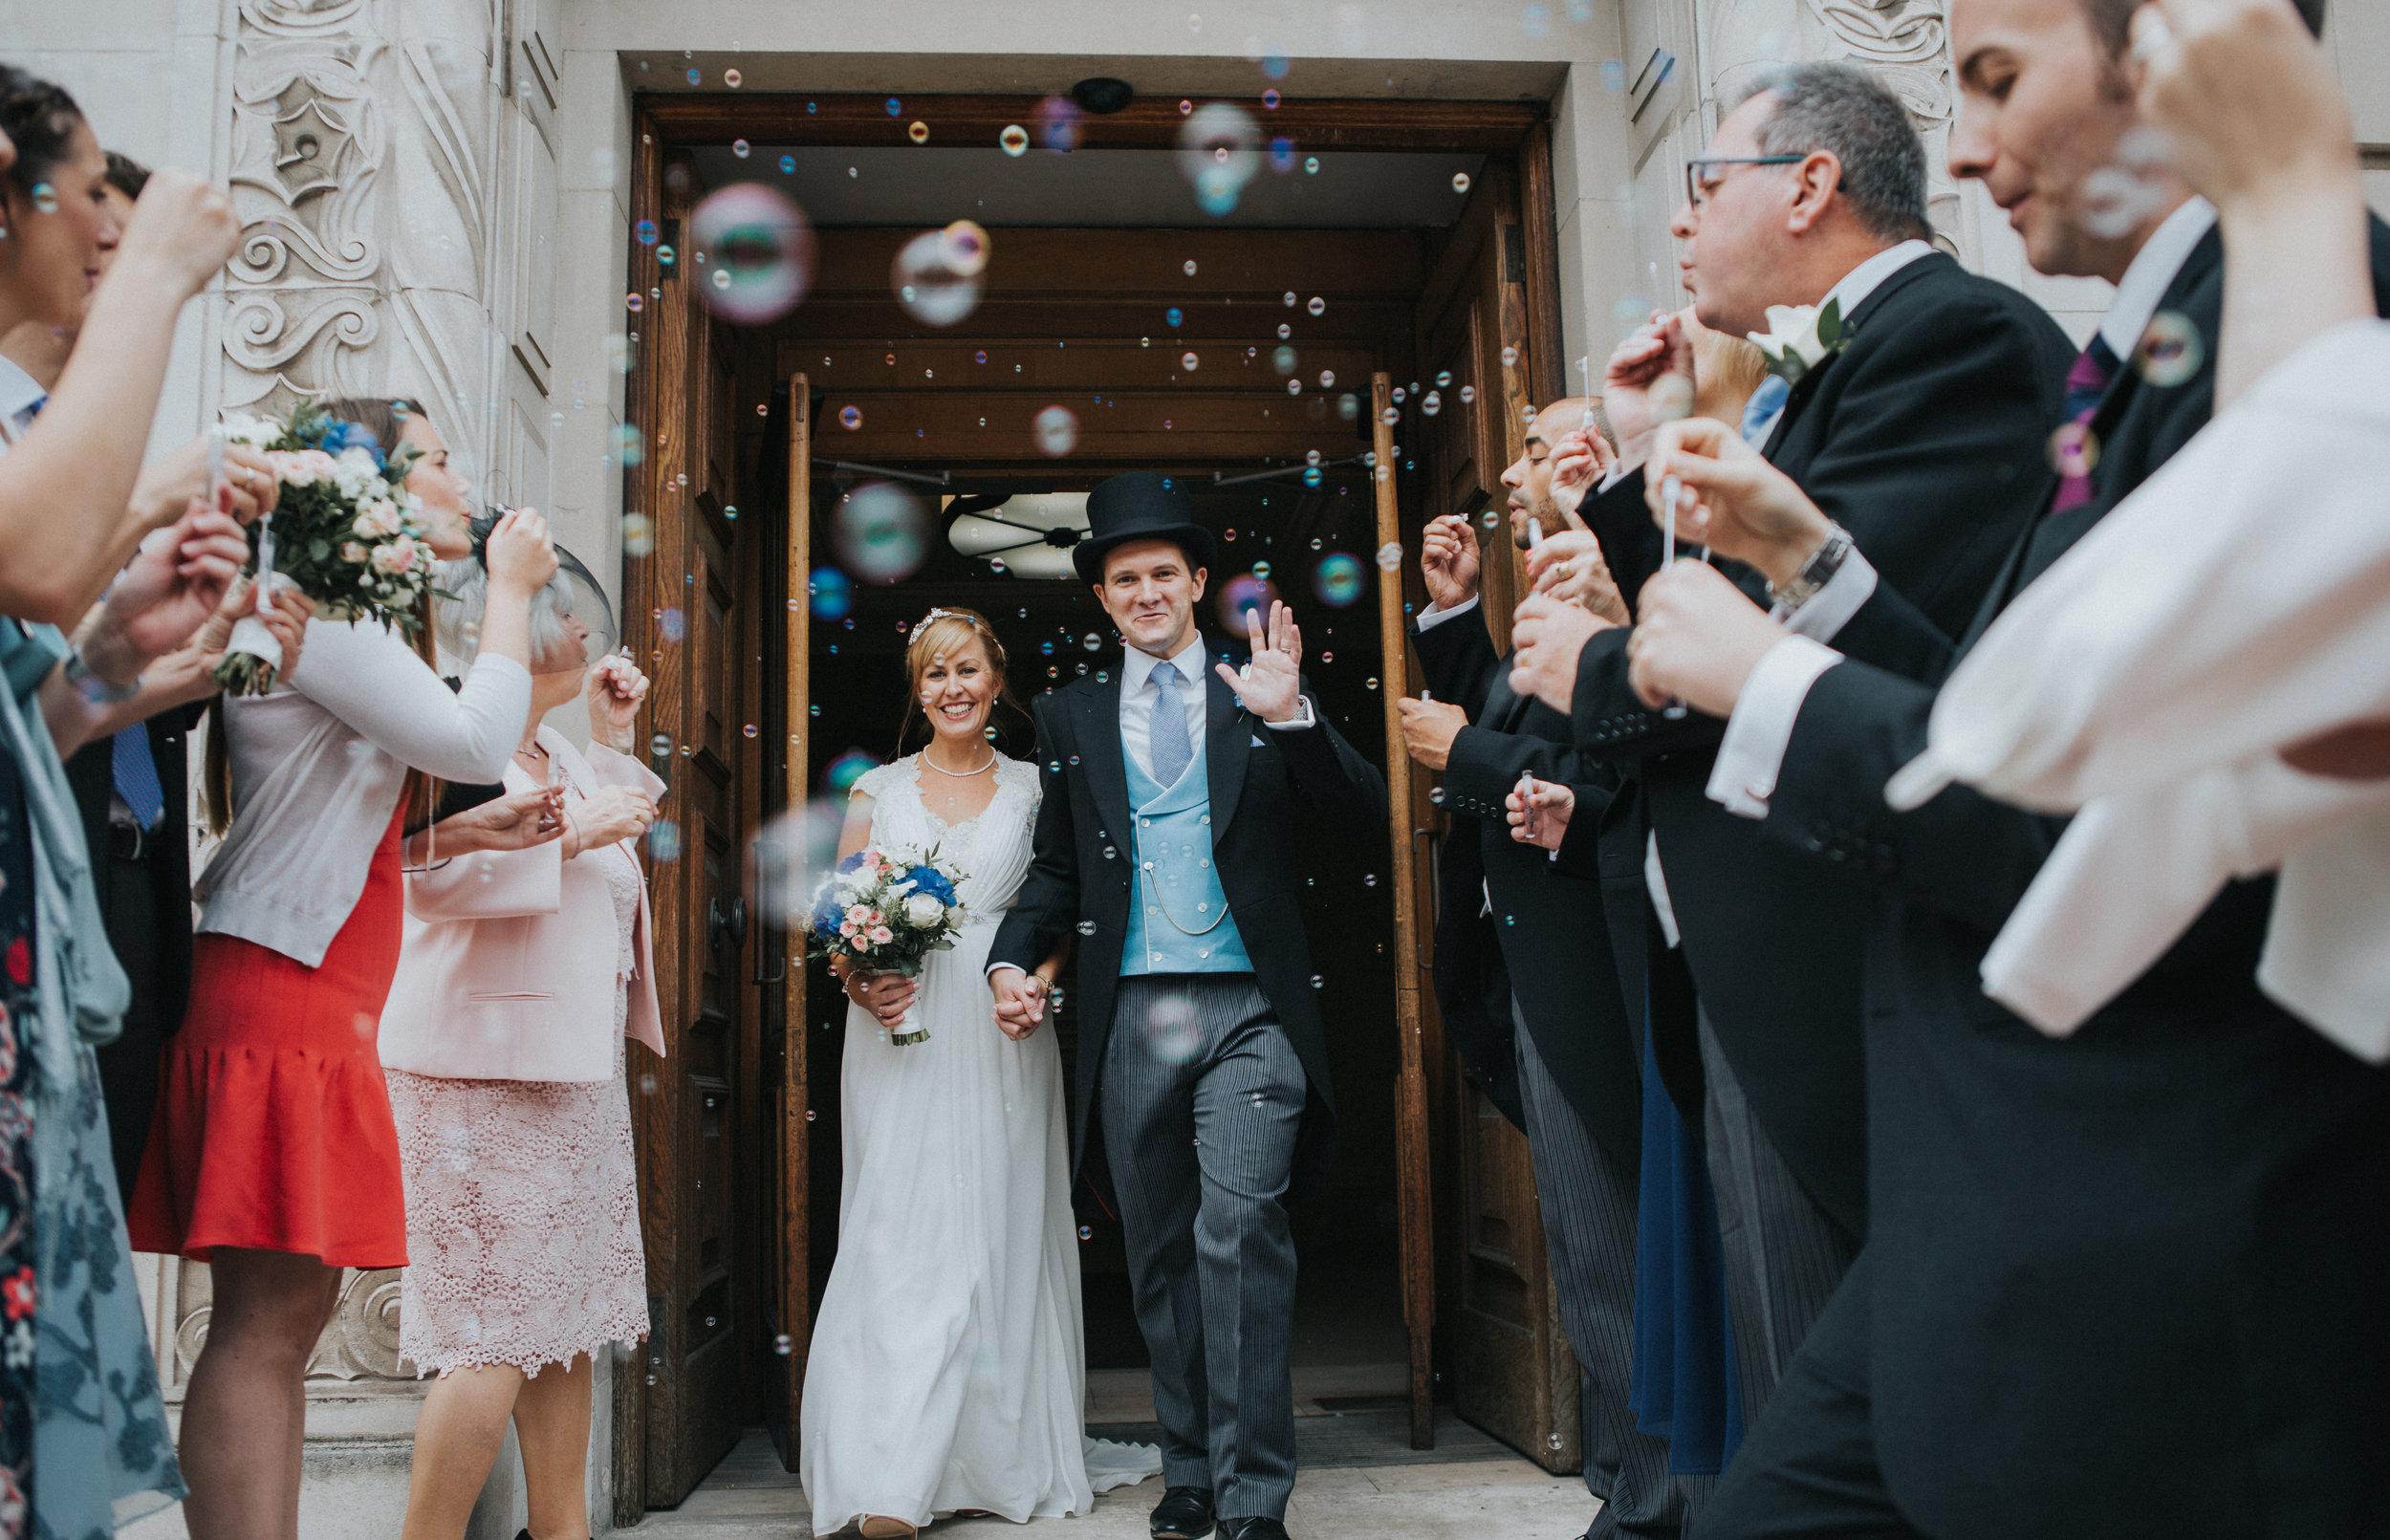 london-wedding-photography-wimbledon-wandsworth-town-hall-savoy-hotel-bubble-confetti-arch-50